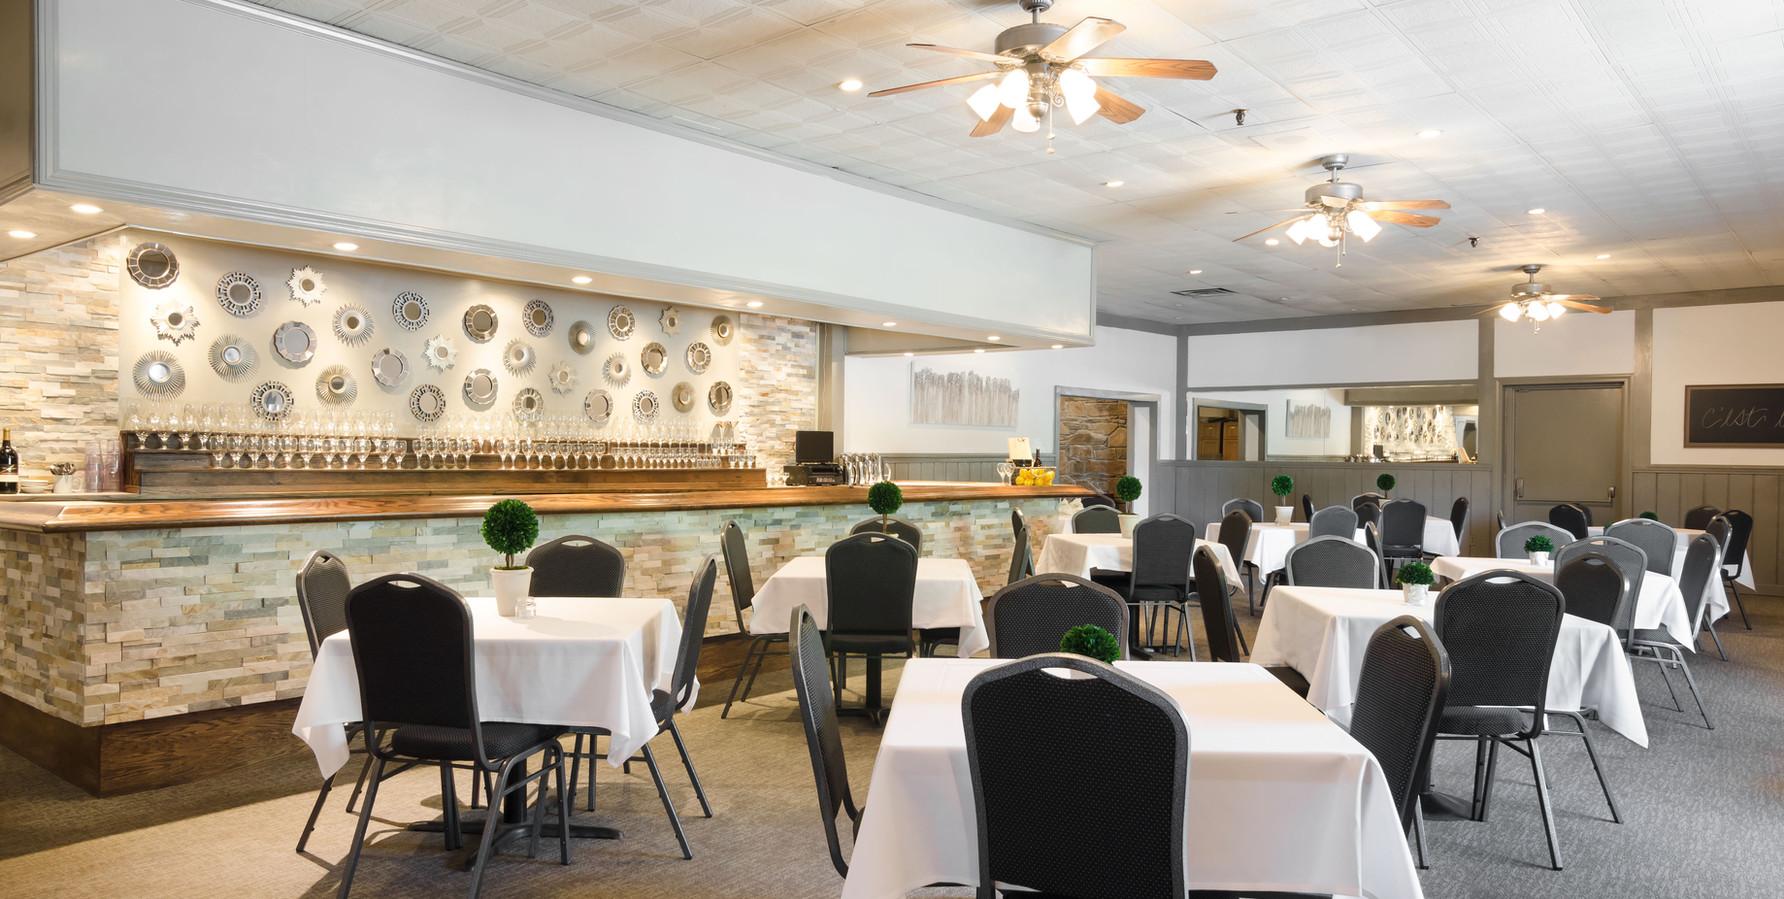 Banquet Room Revamp [After]